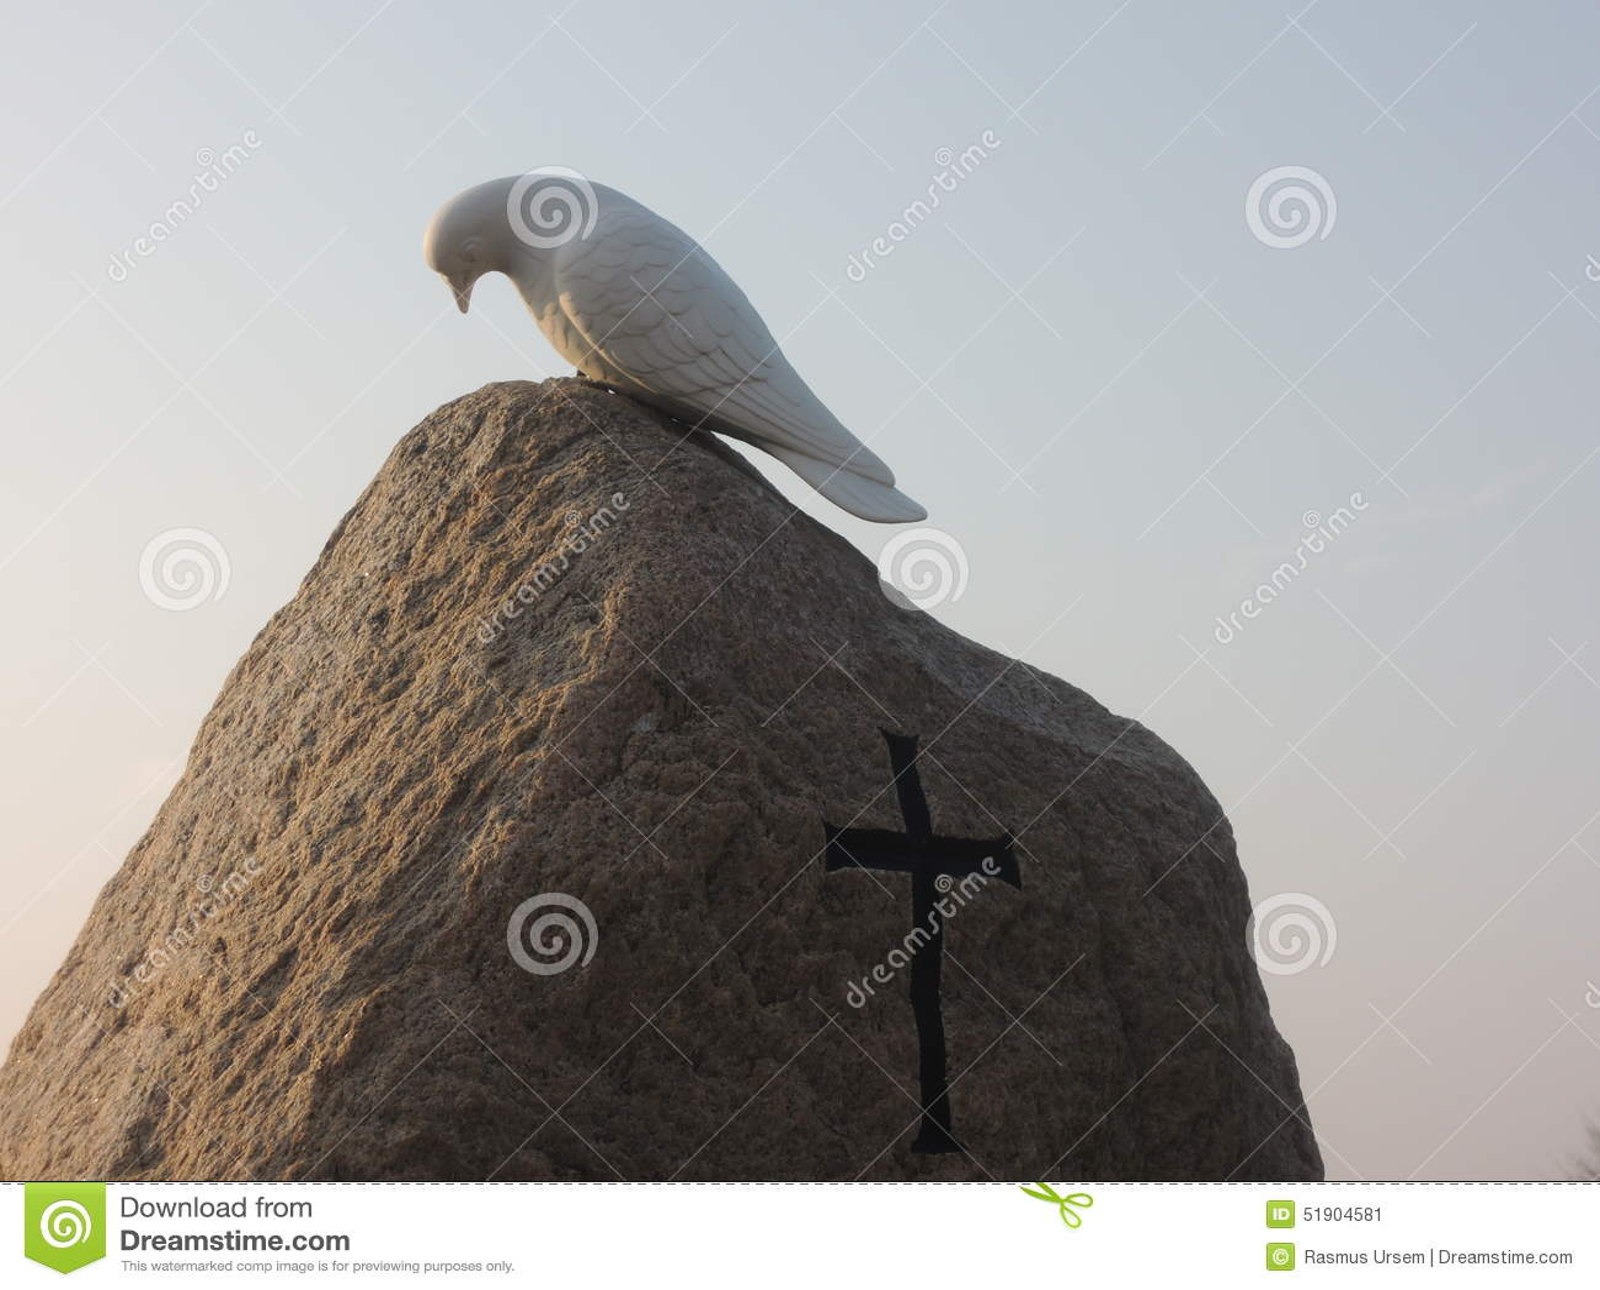 Holy Spirit sheparding a soul to Heaven